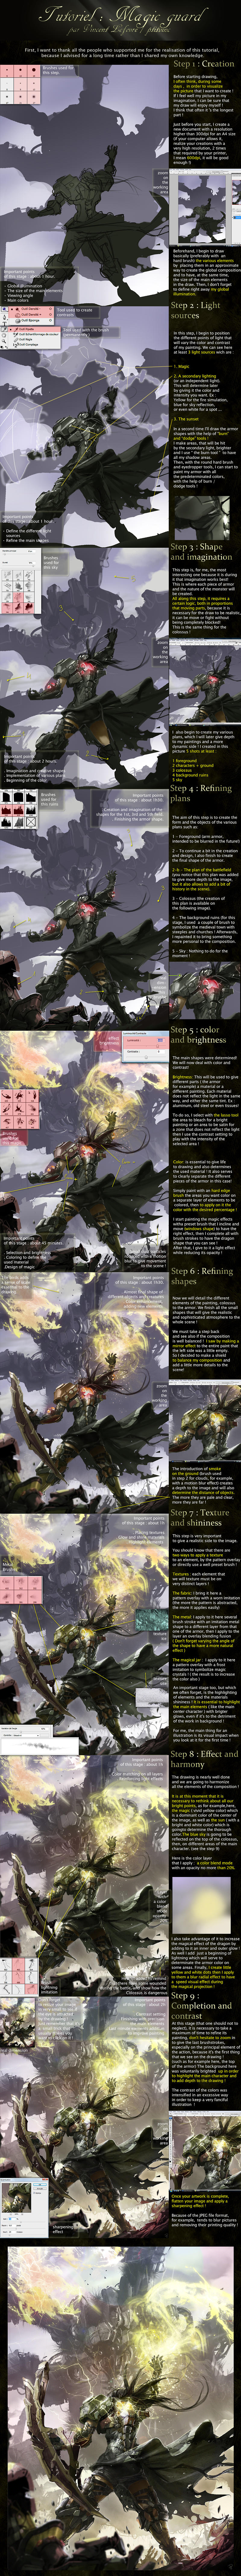 tutorial : magic guard anglais by ptitvinc